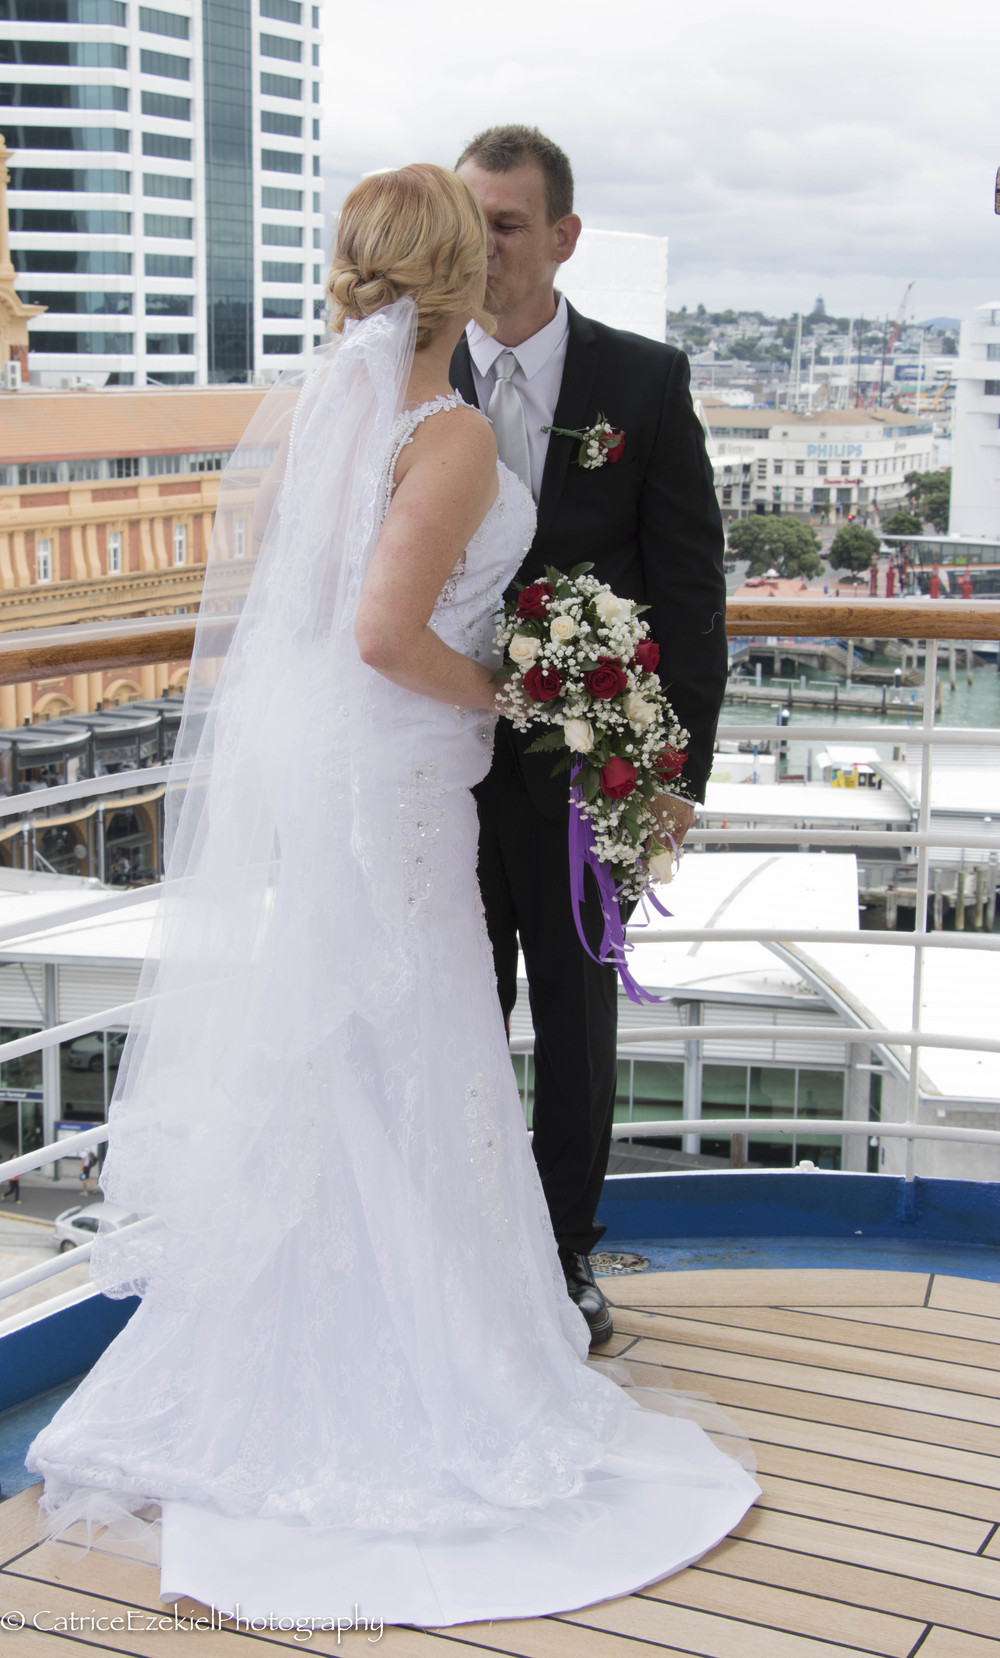 TA_WeddingJPEG_01-7.jpg